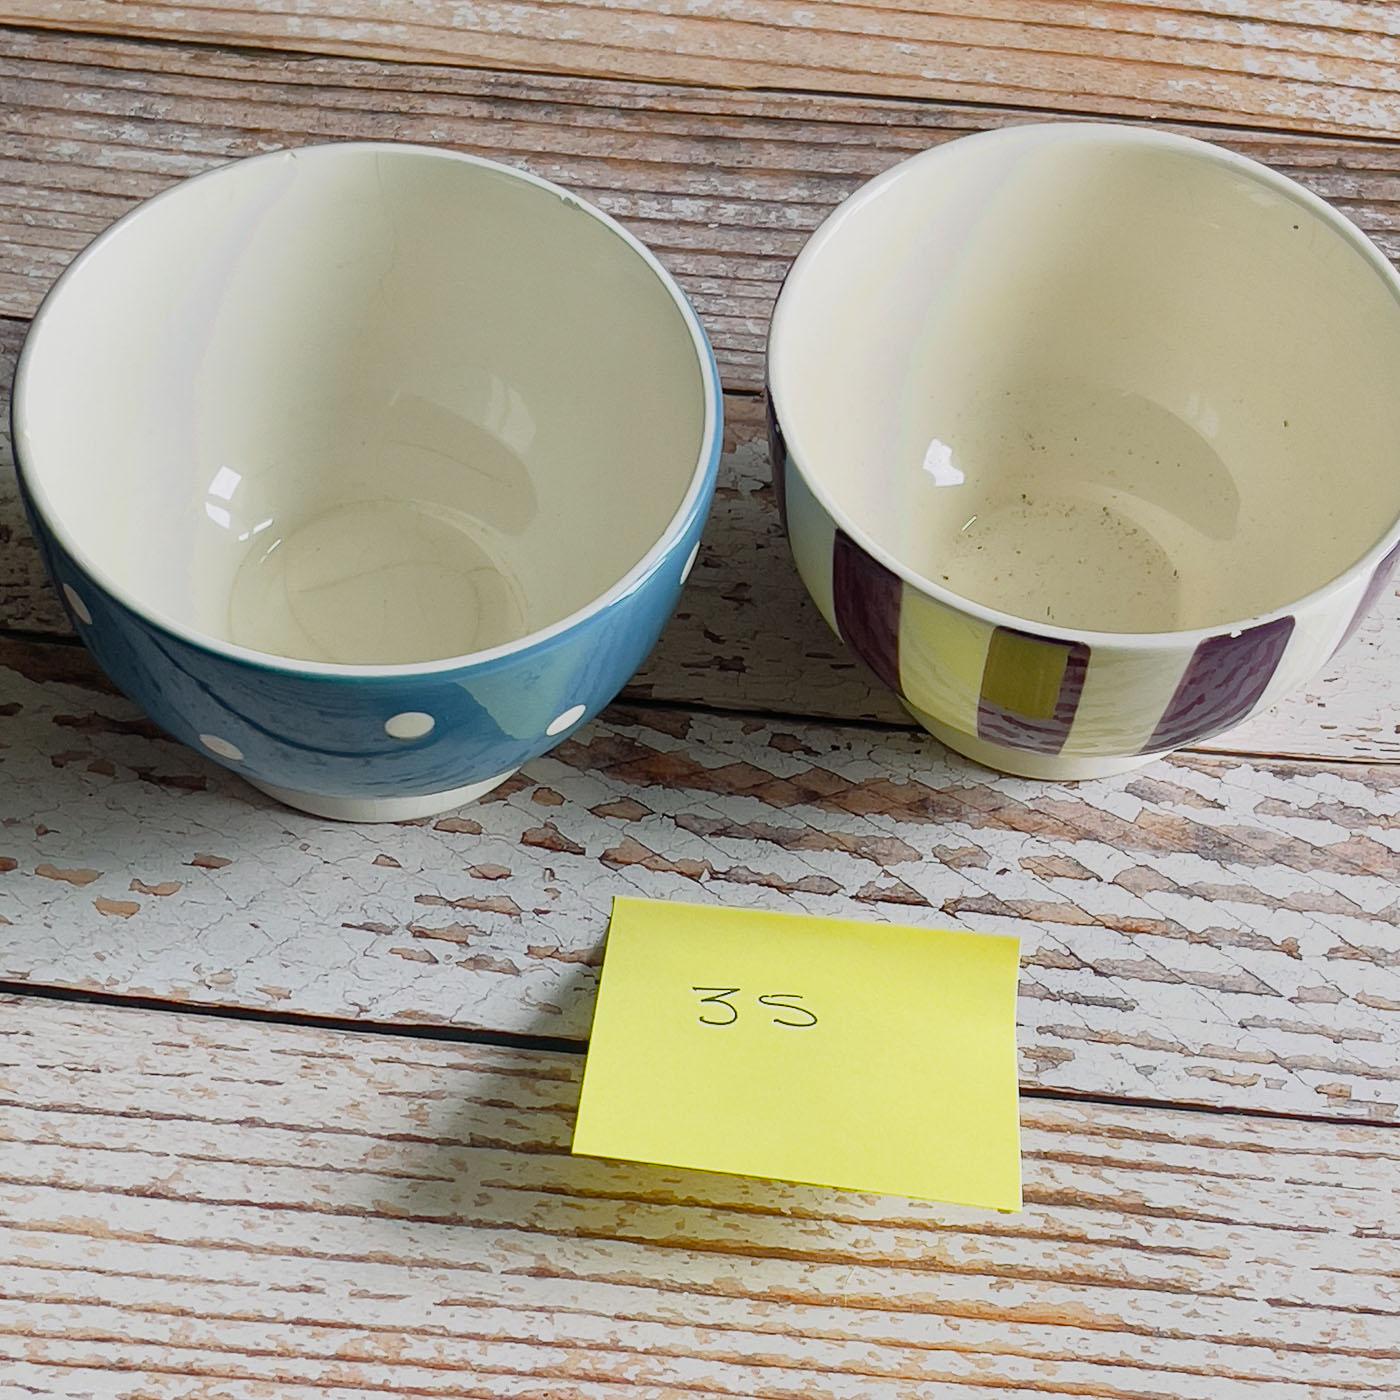 bols céramiques bleu et violet